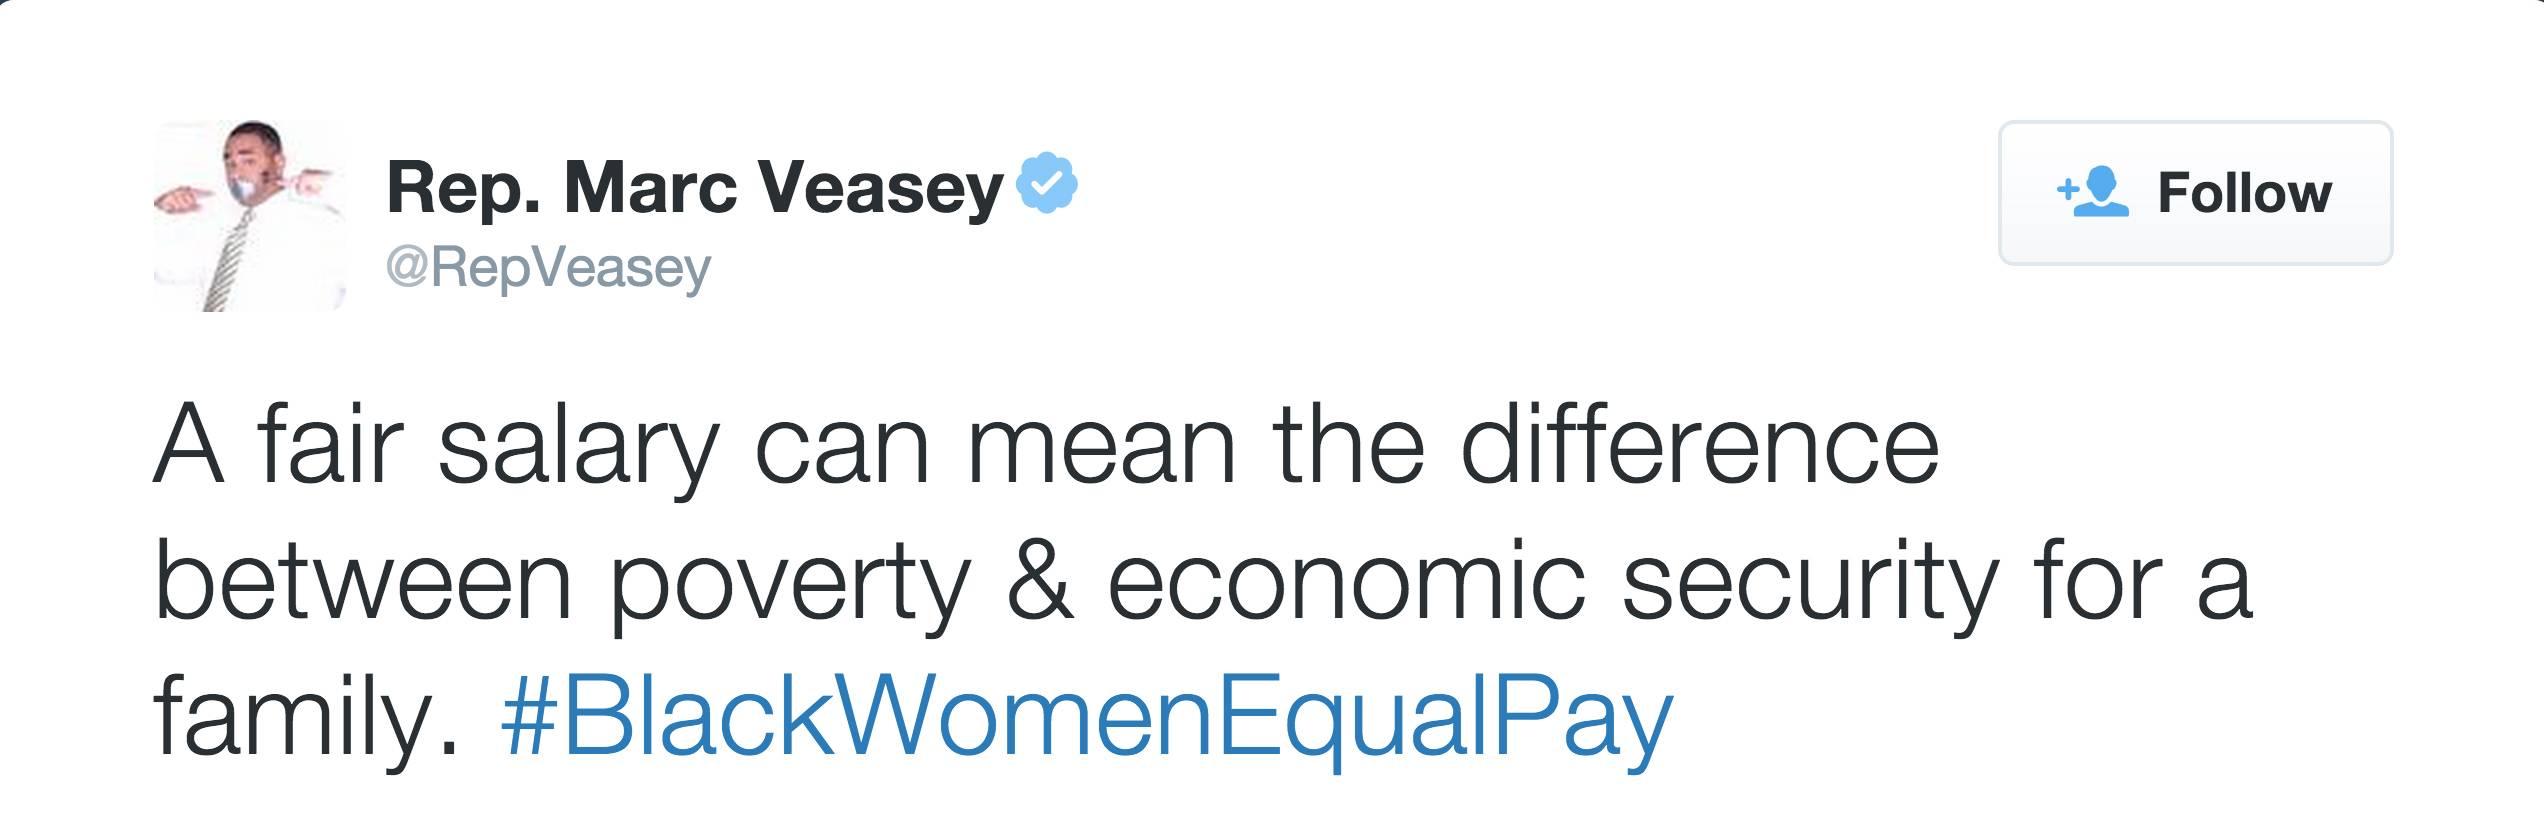 @RepVeasey - (Photo: Representative Marc Veasey via Twitter)